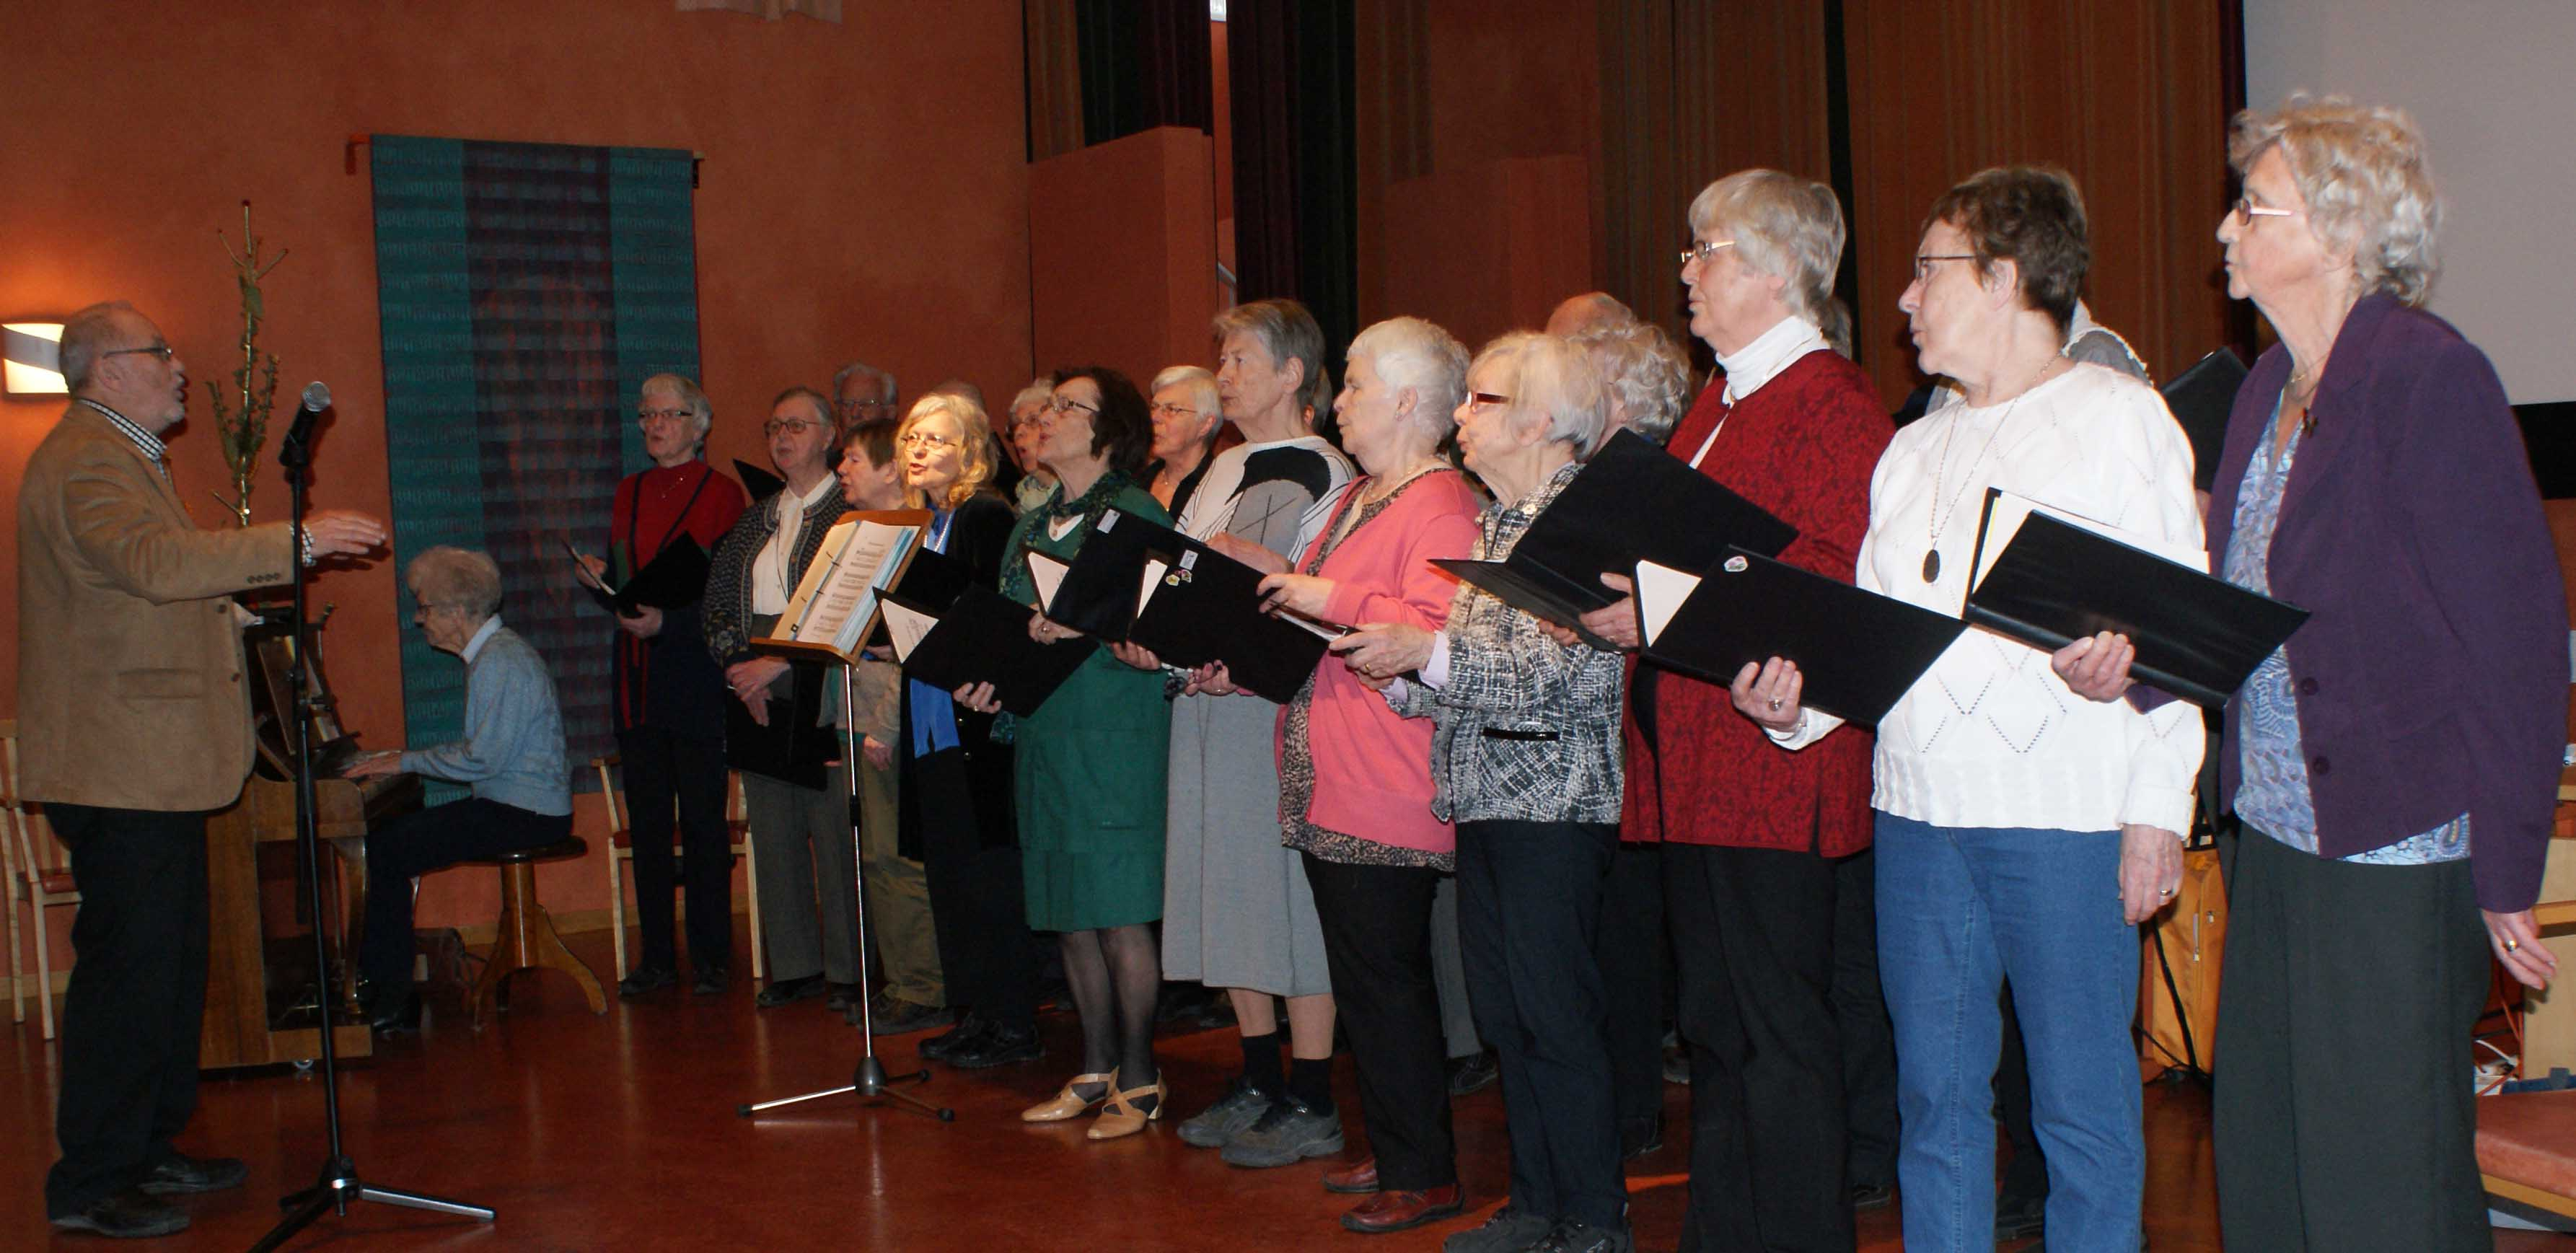 SPF-distrikt Y möts i Härnösand